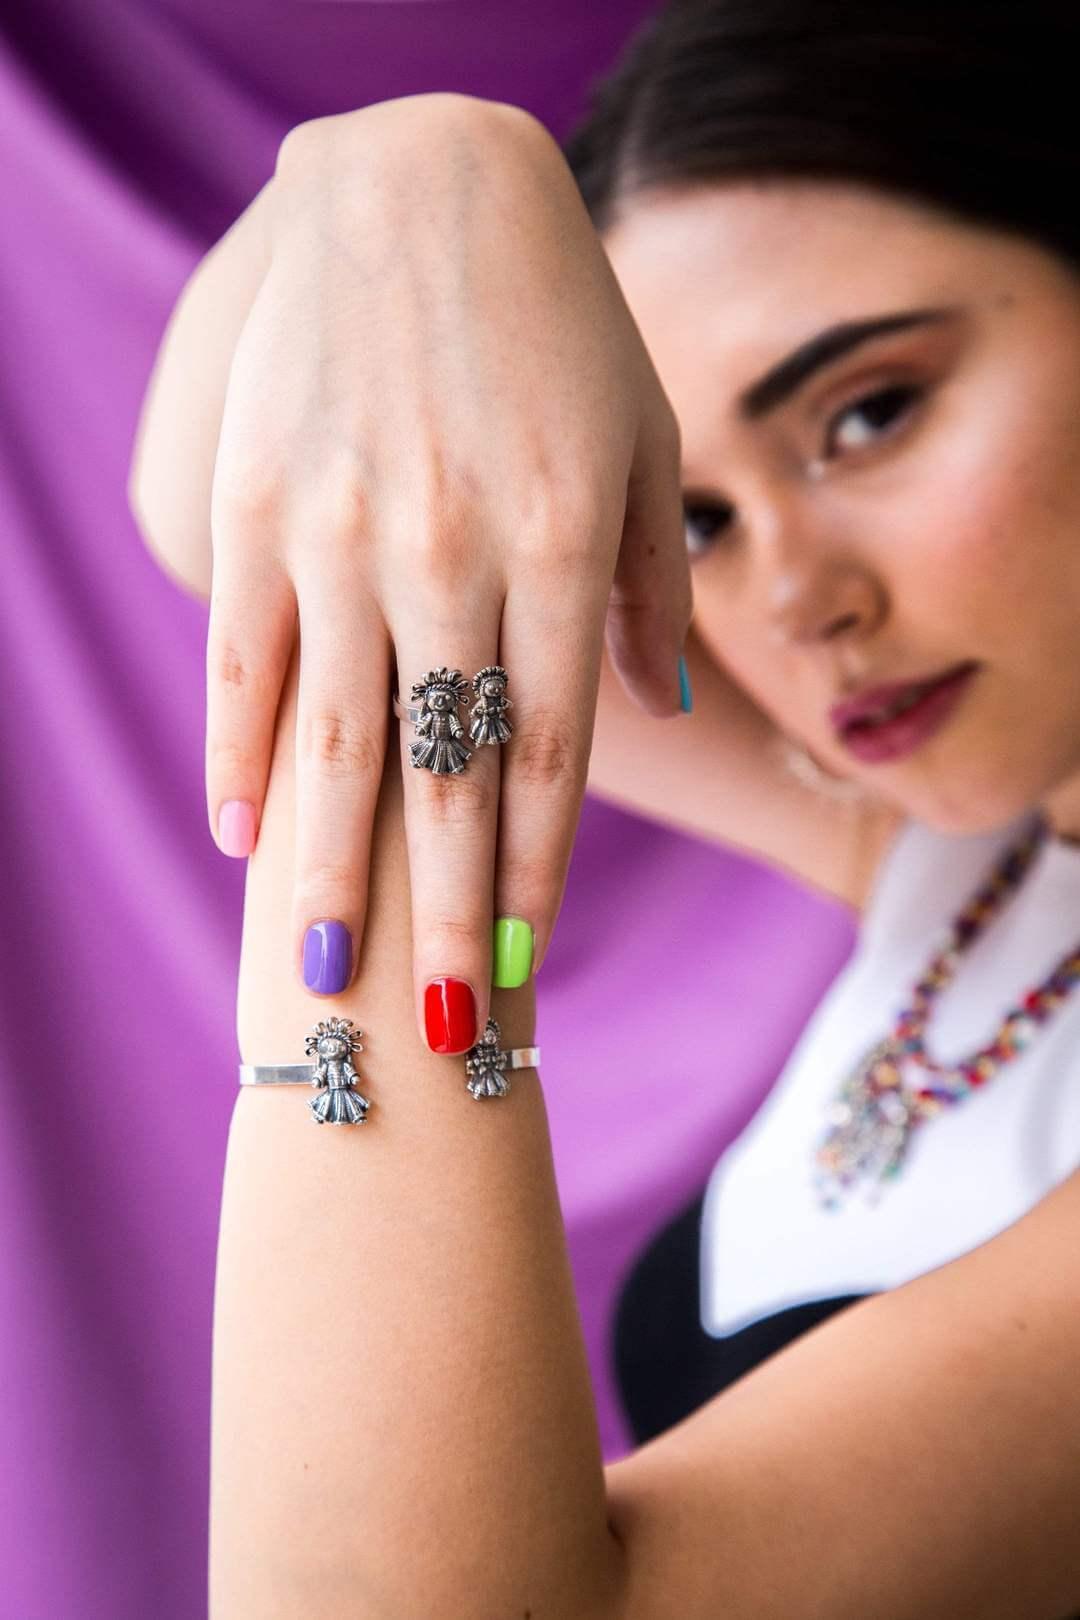 joyas mexicanas gabriela sanchez anillo muneca ch y muneca mini anillo gabriela sanchez